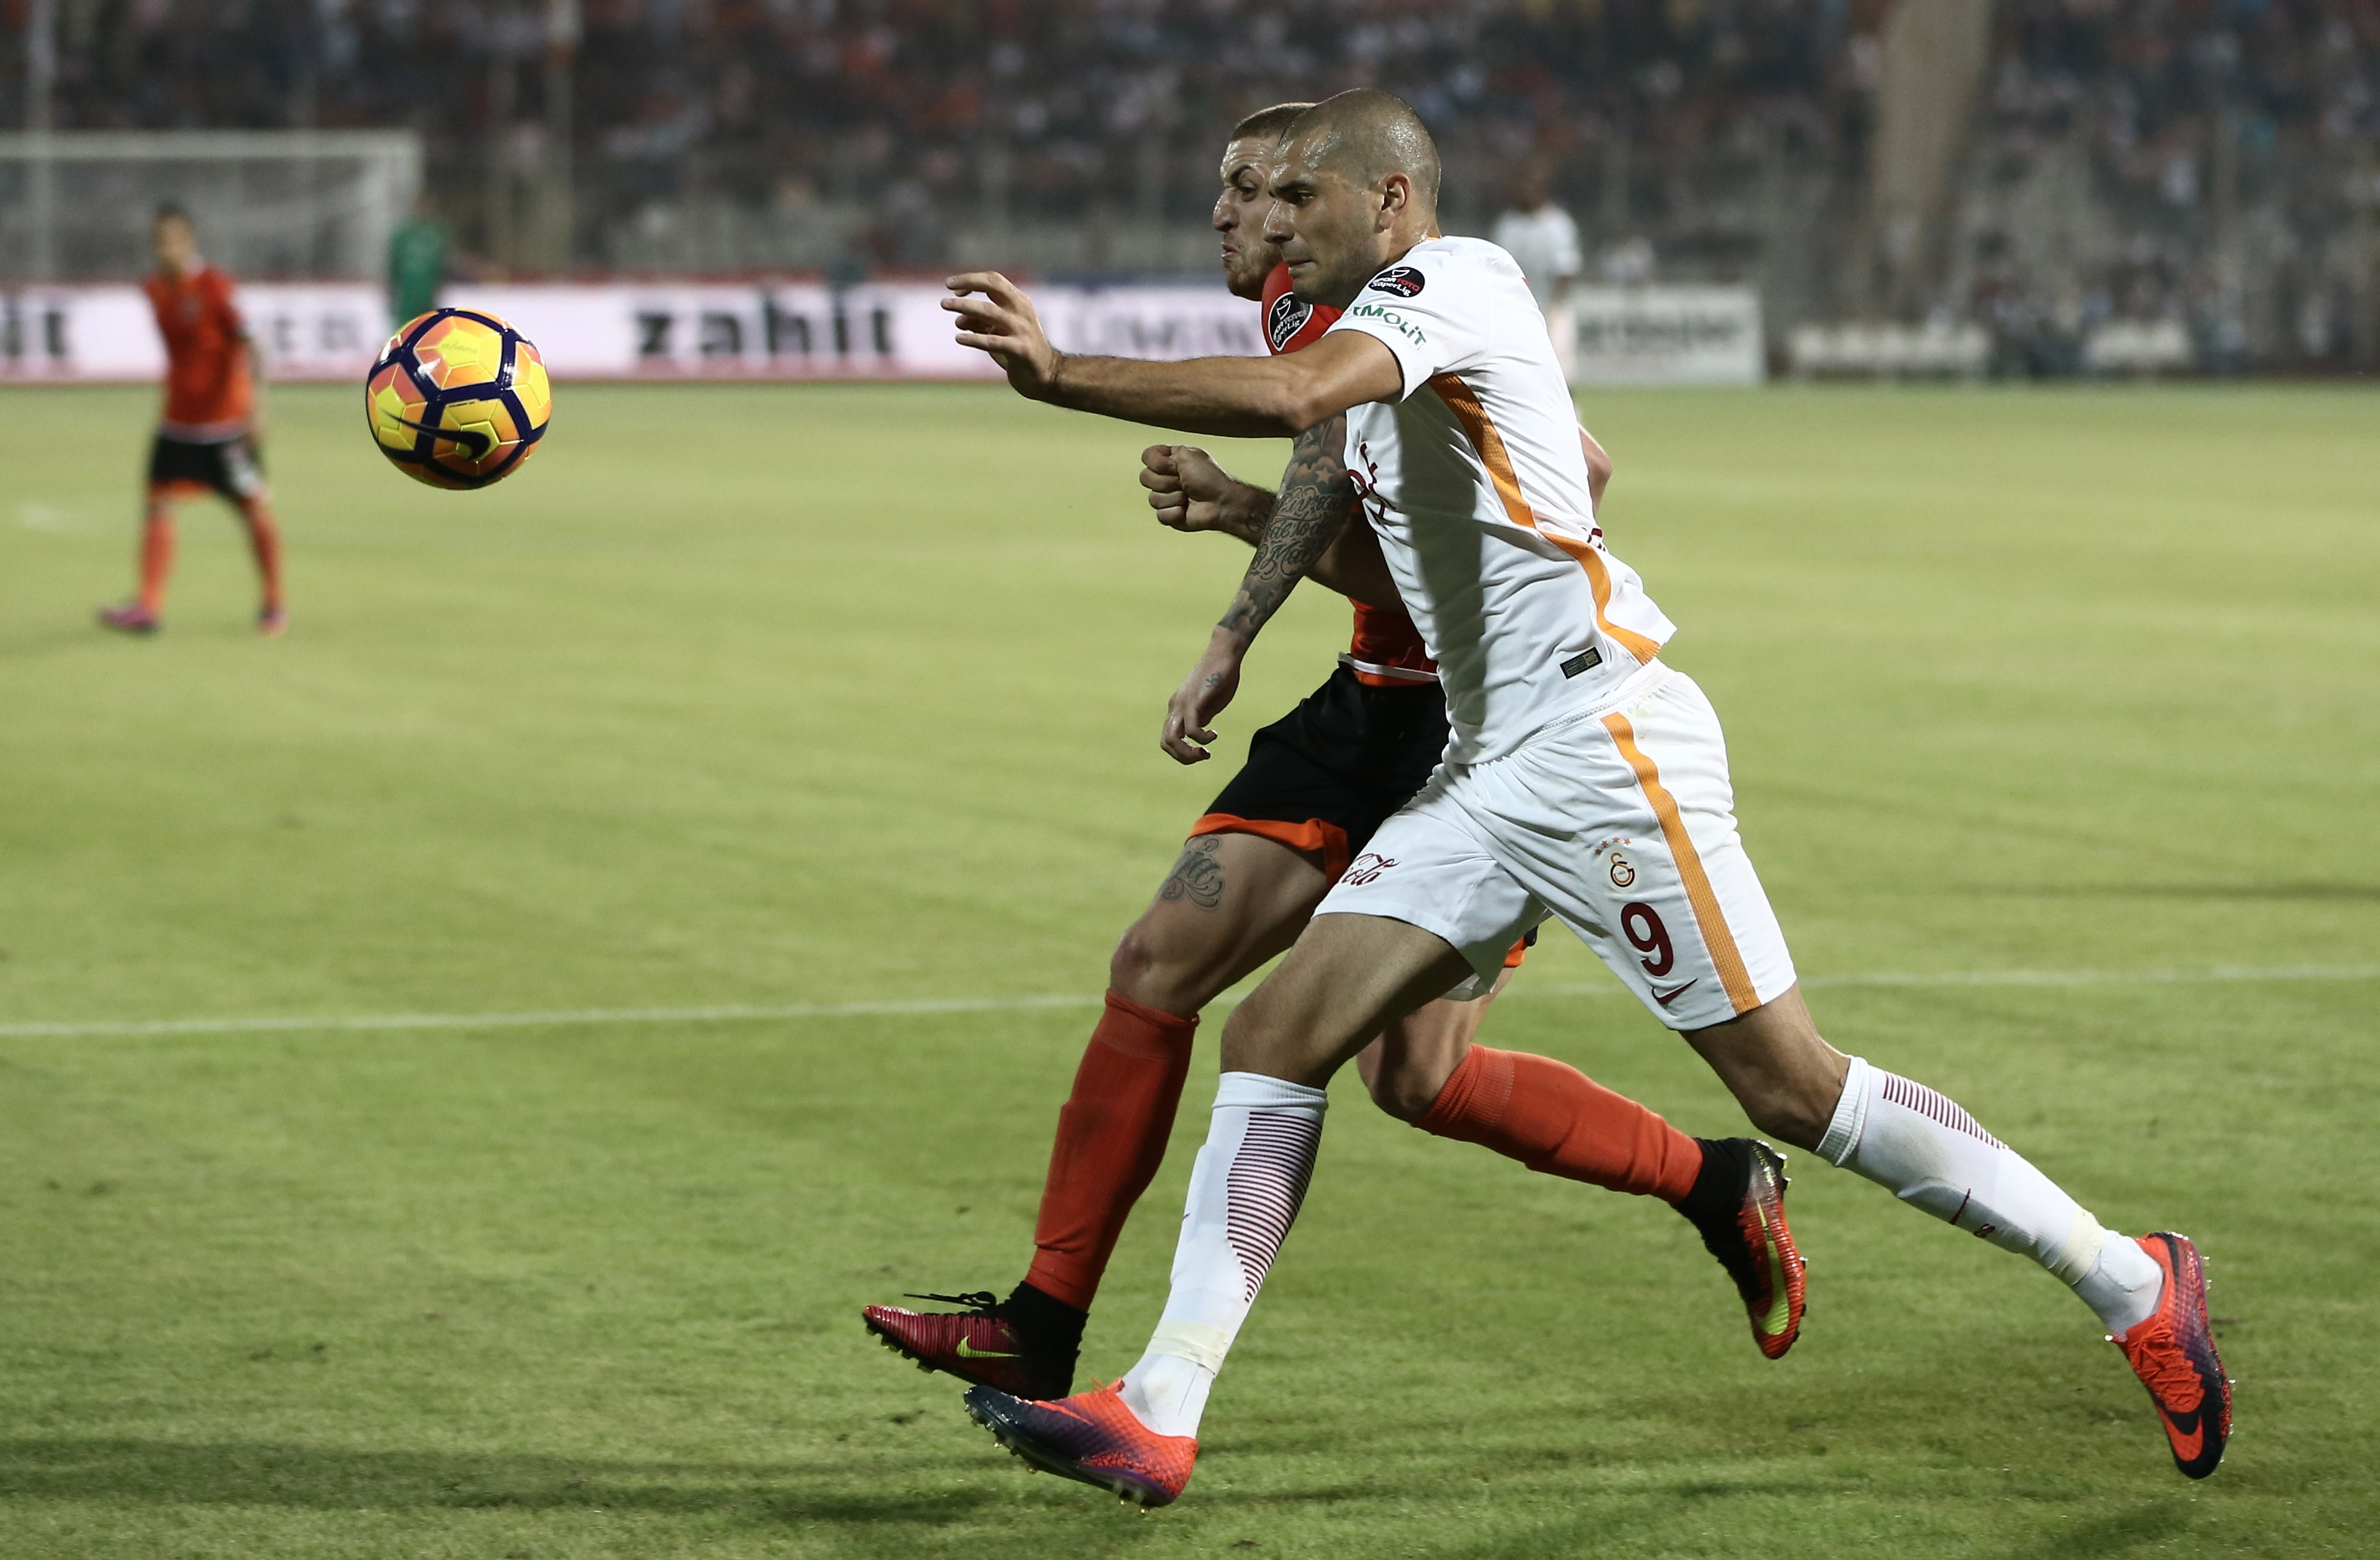 Adanaspor - Galatasaray (Eren Derdiyok)